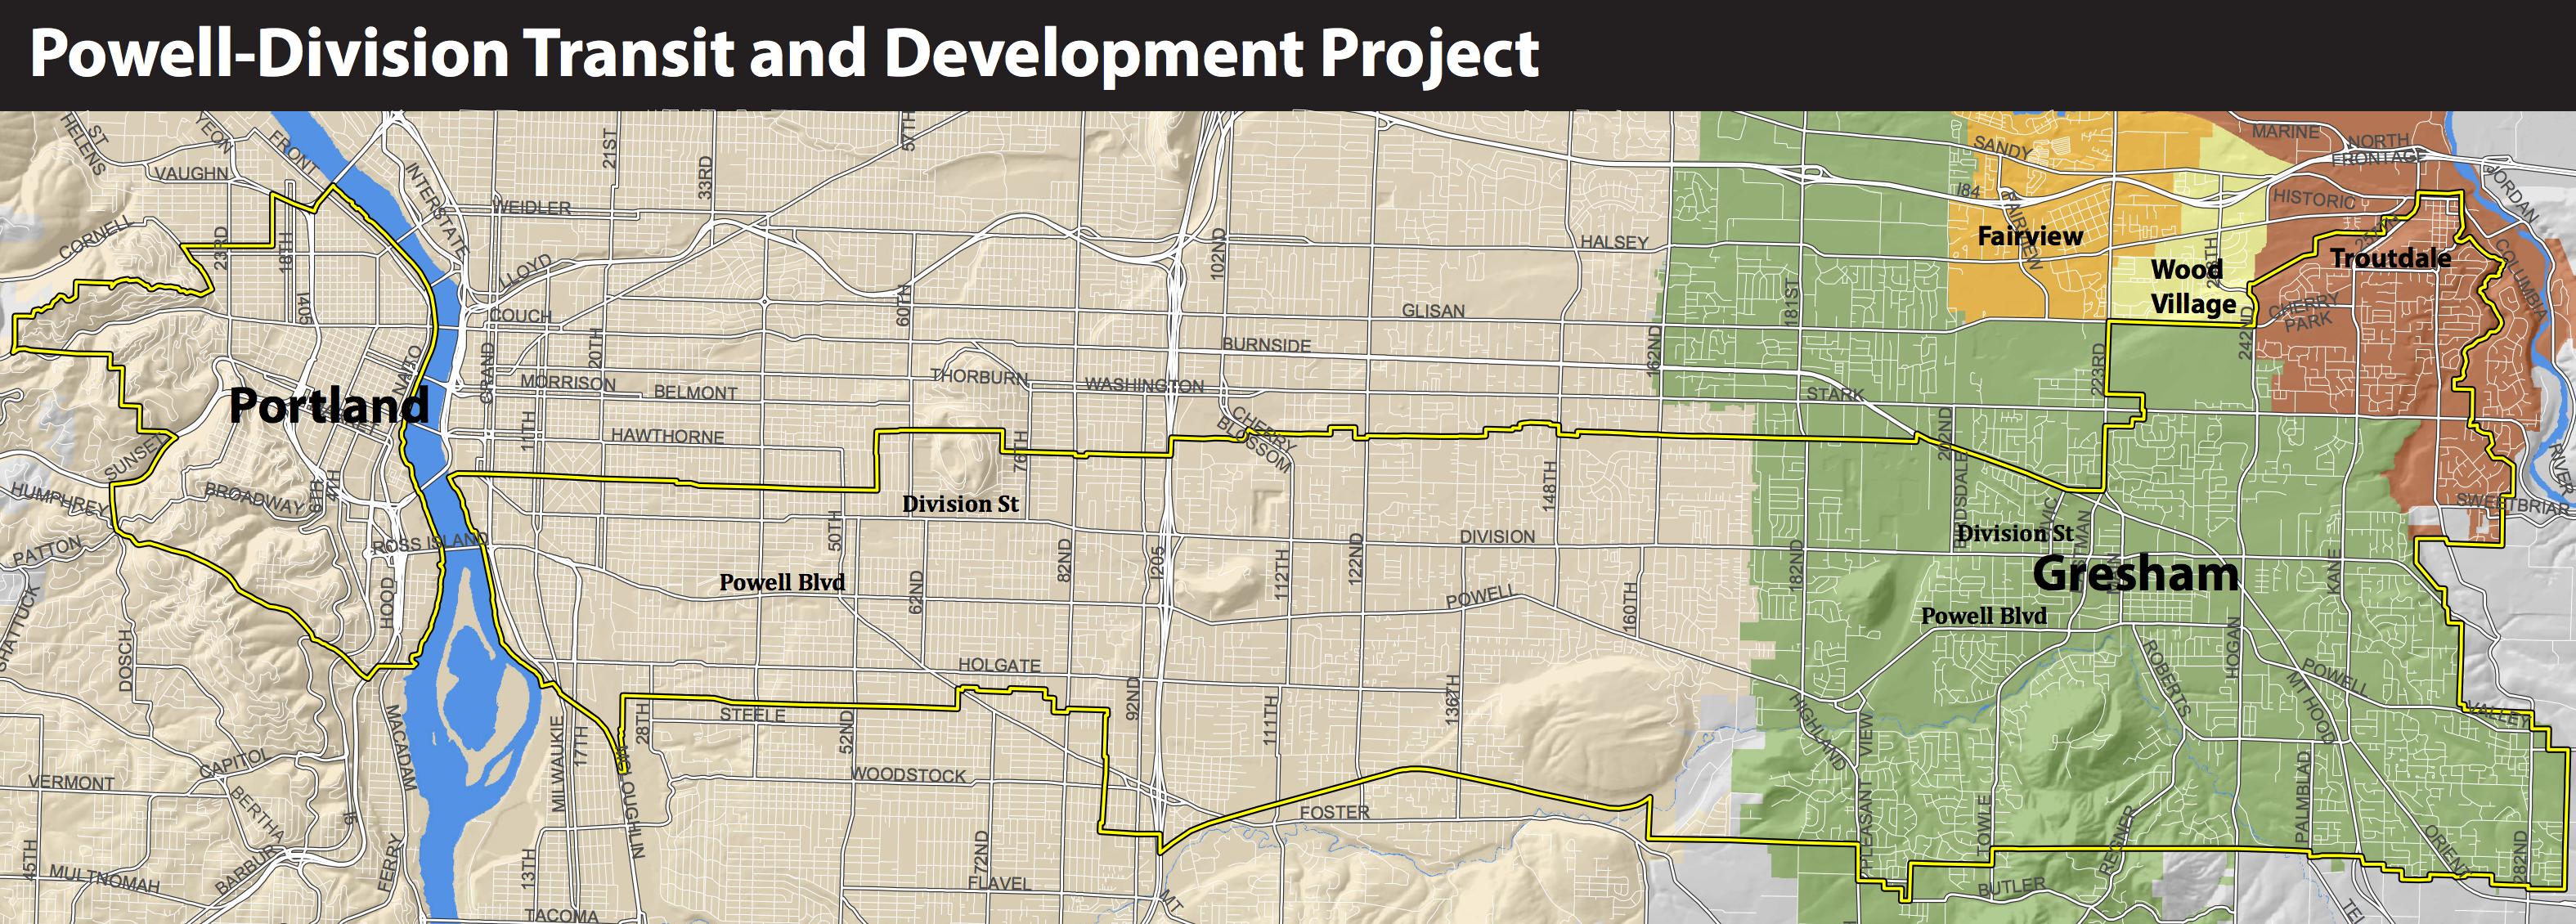 www_oregonmetro_gov_sites_default_files_powell-division-project-atlas_pdf